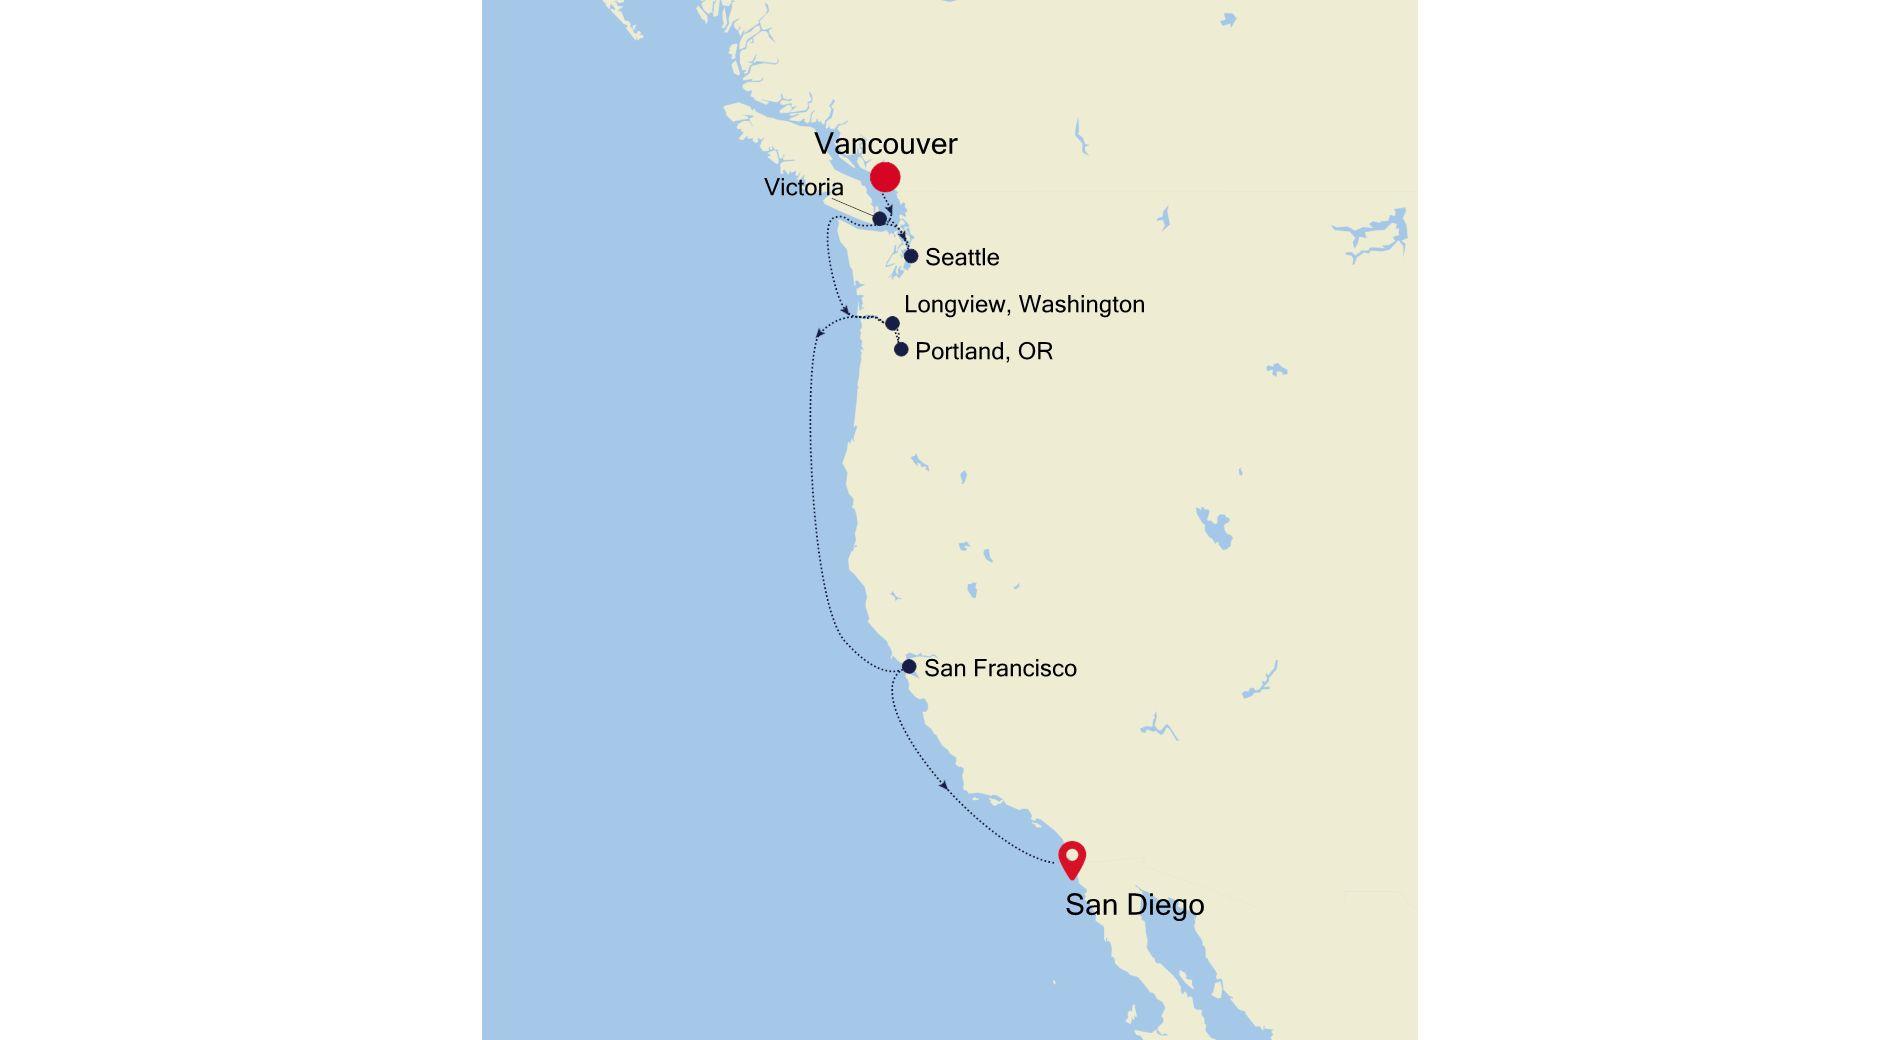 E4201008009 - Vancouver à San Diego